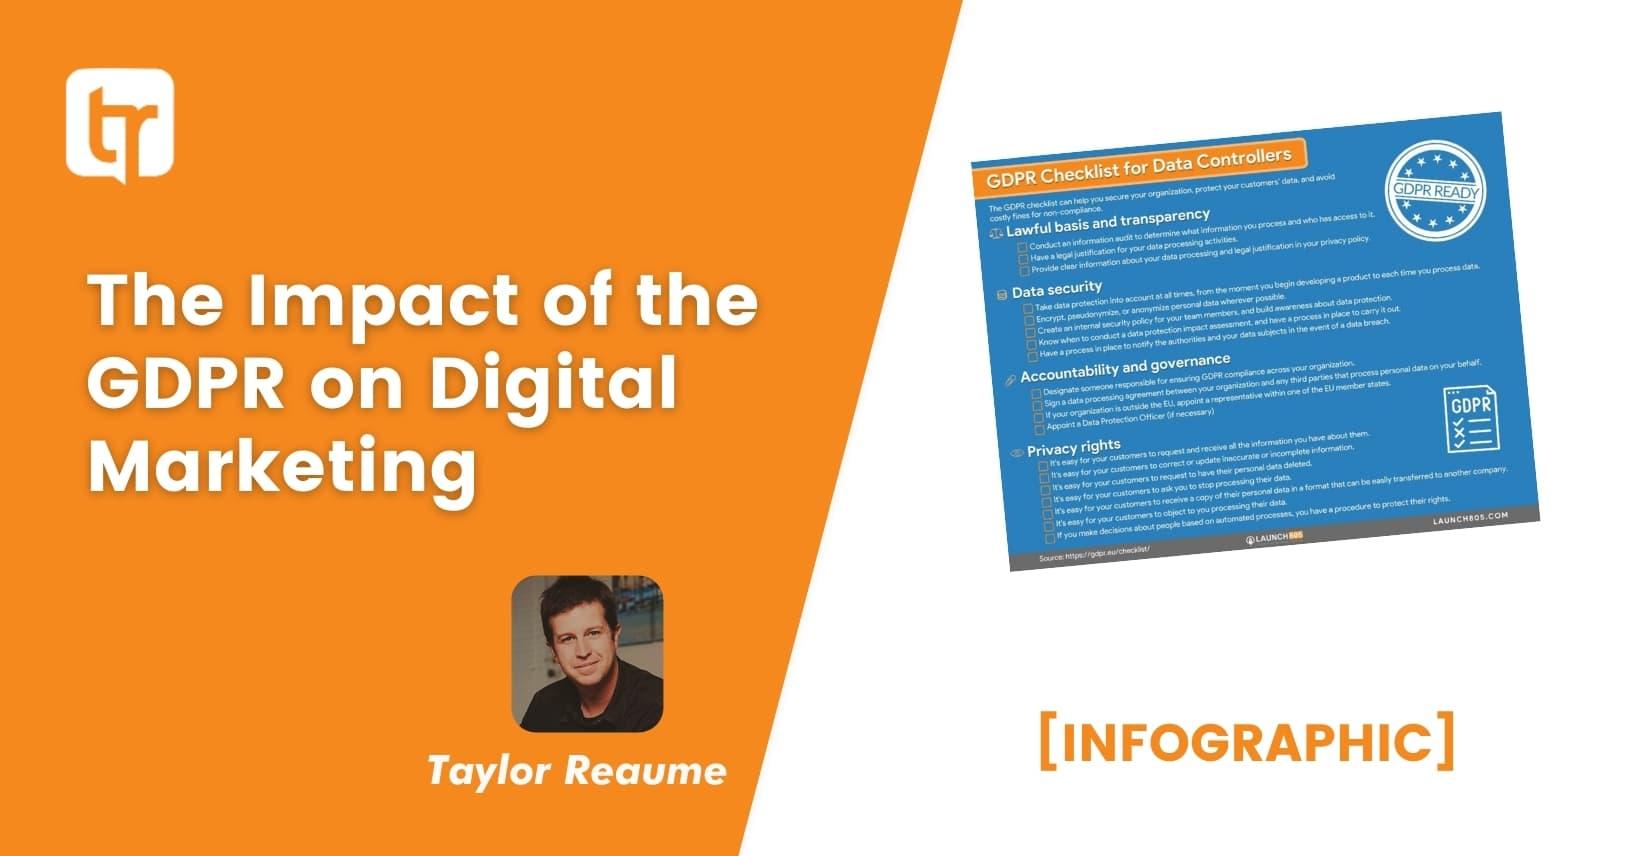 The Impact of GDPR on Digital Marketing